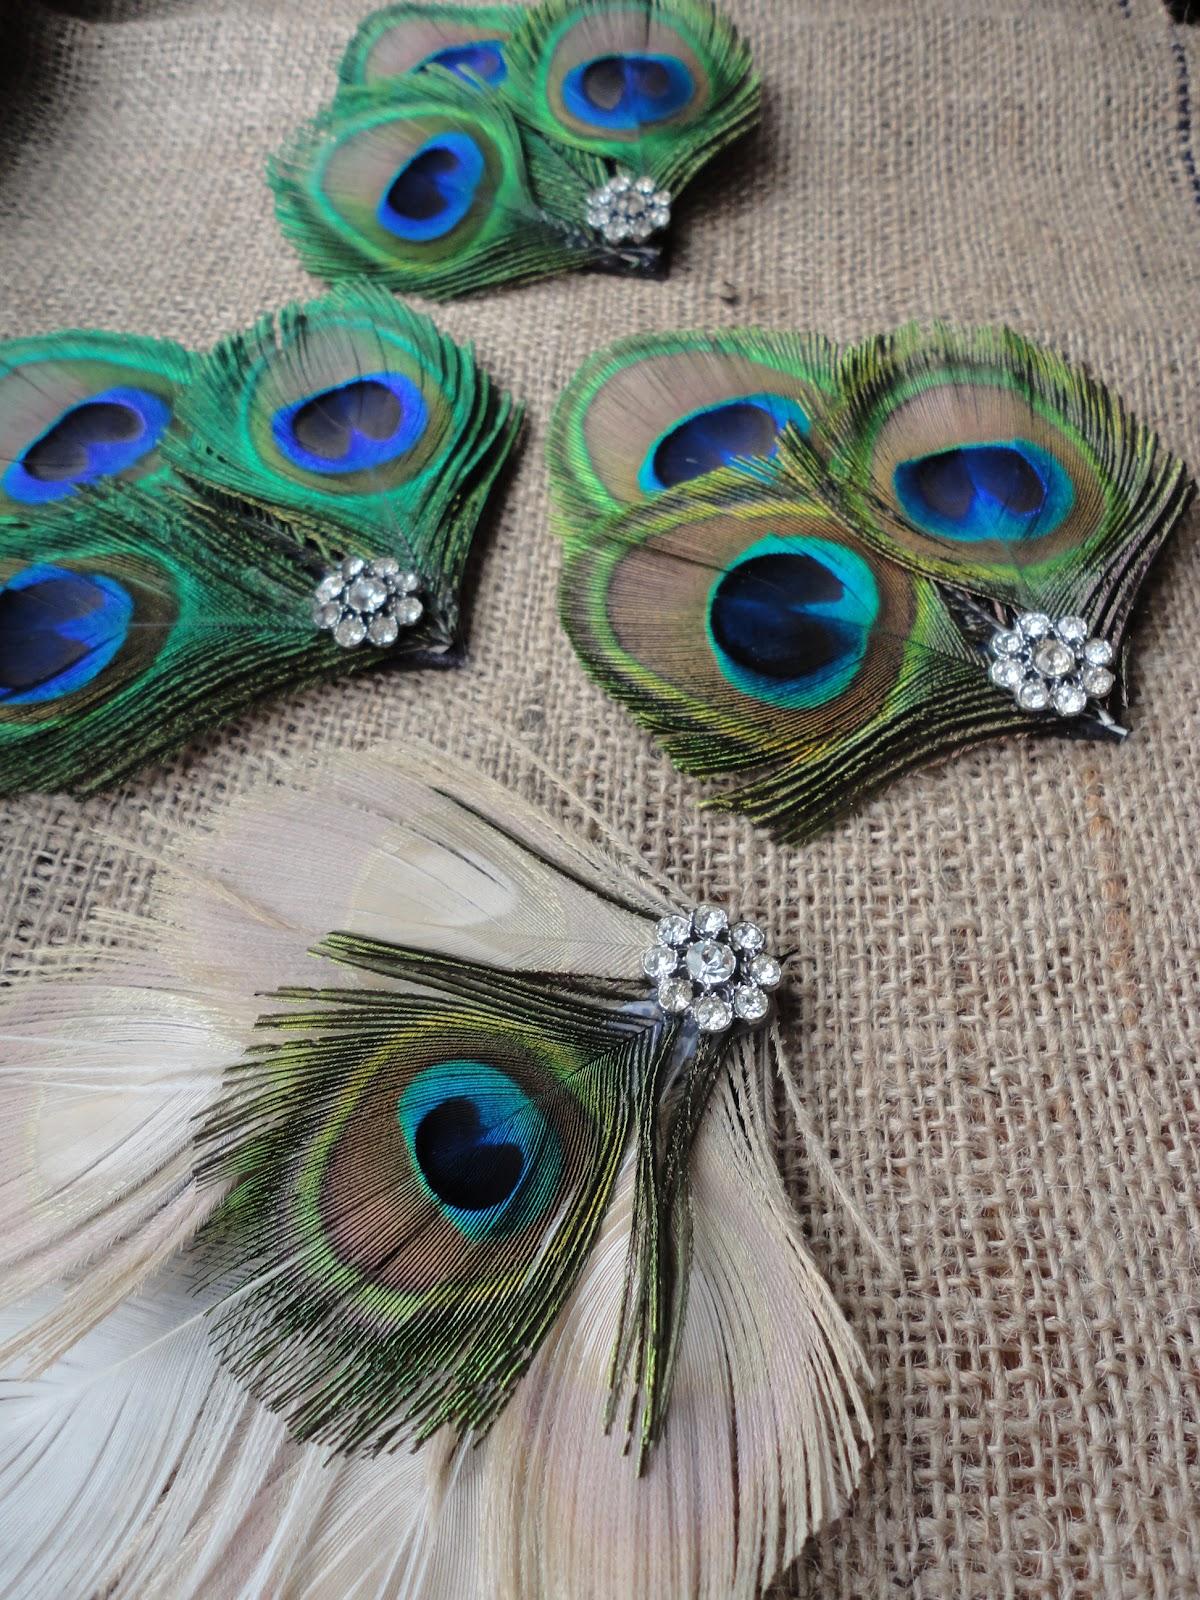 The Peacock Fairy Peacock Hair Clips For A Wedding